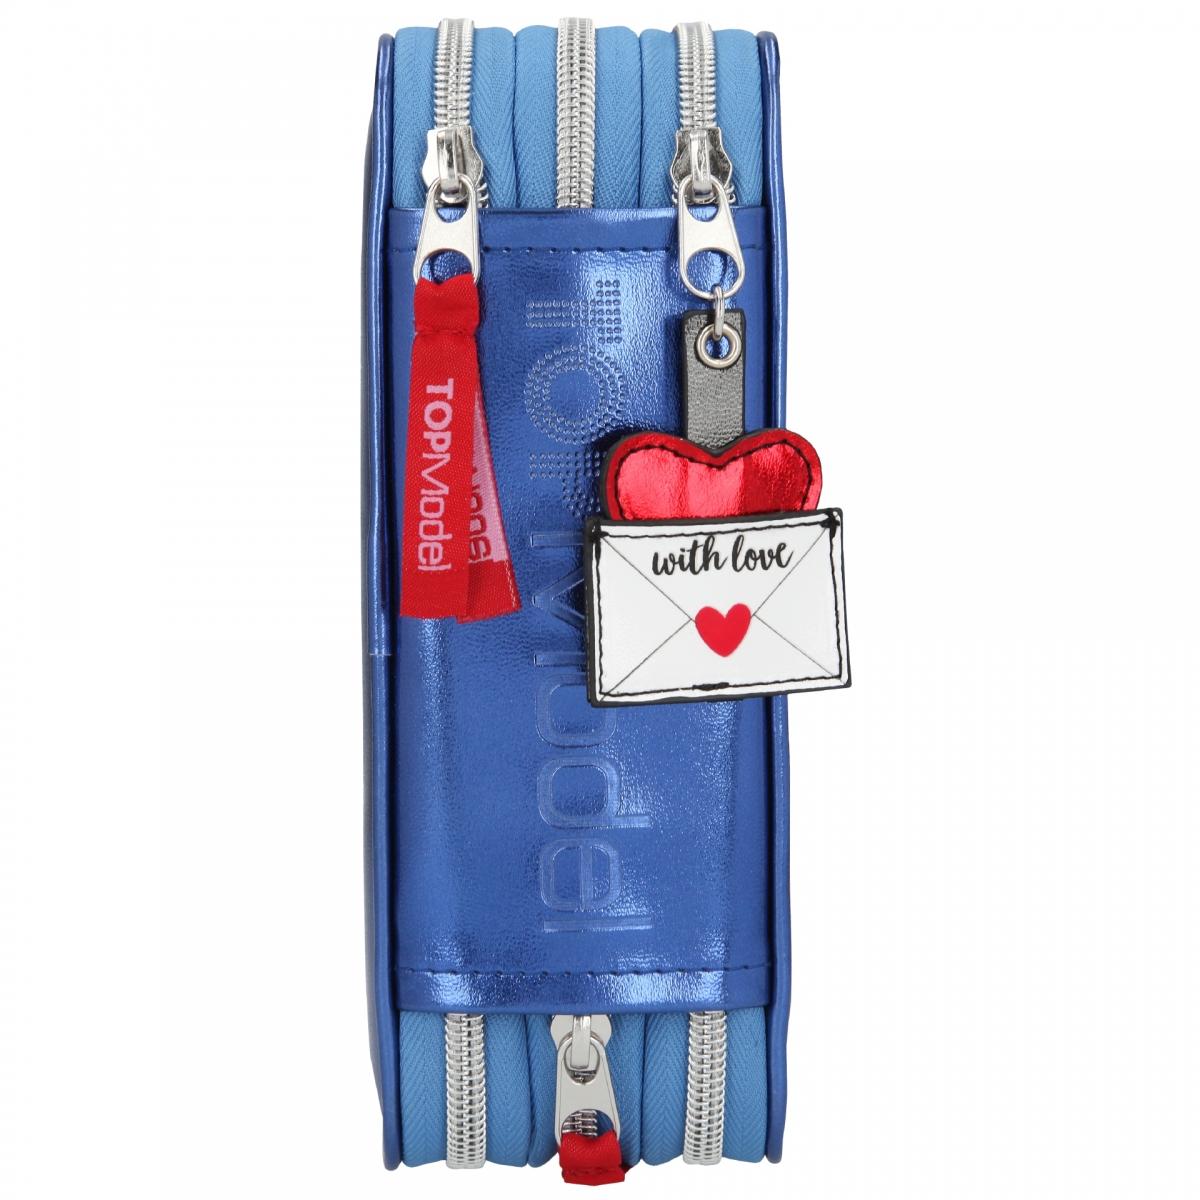 ,Topmodel 3-vaks etui gevuld love letters blauw